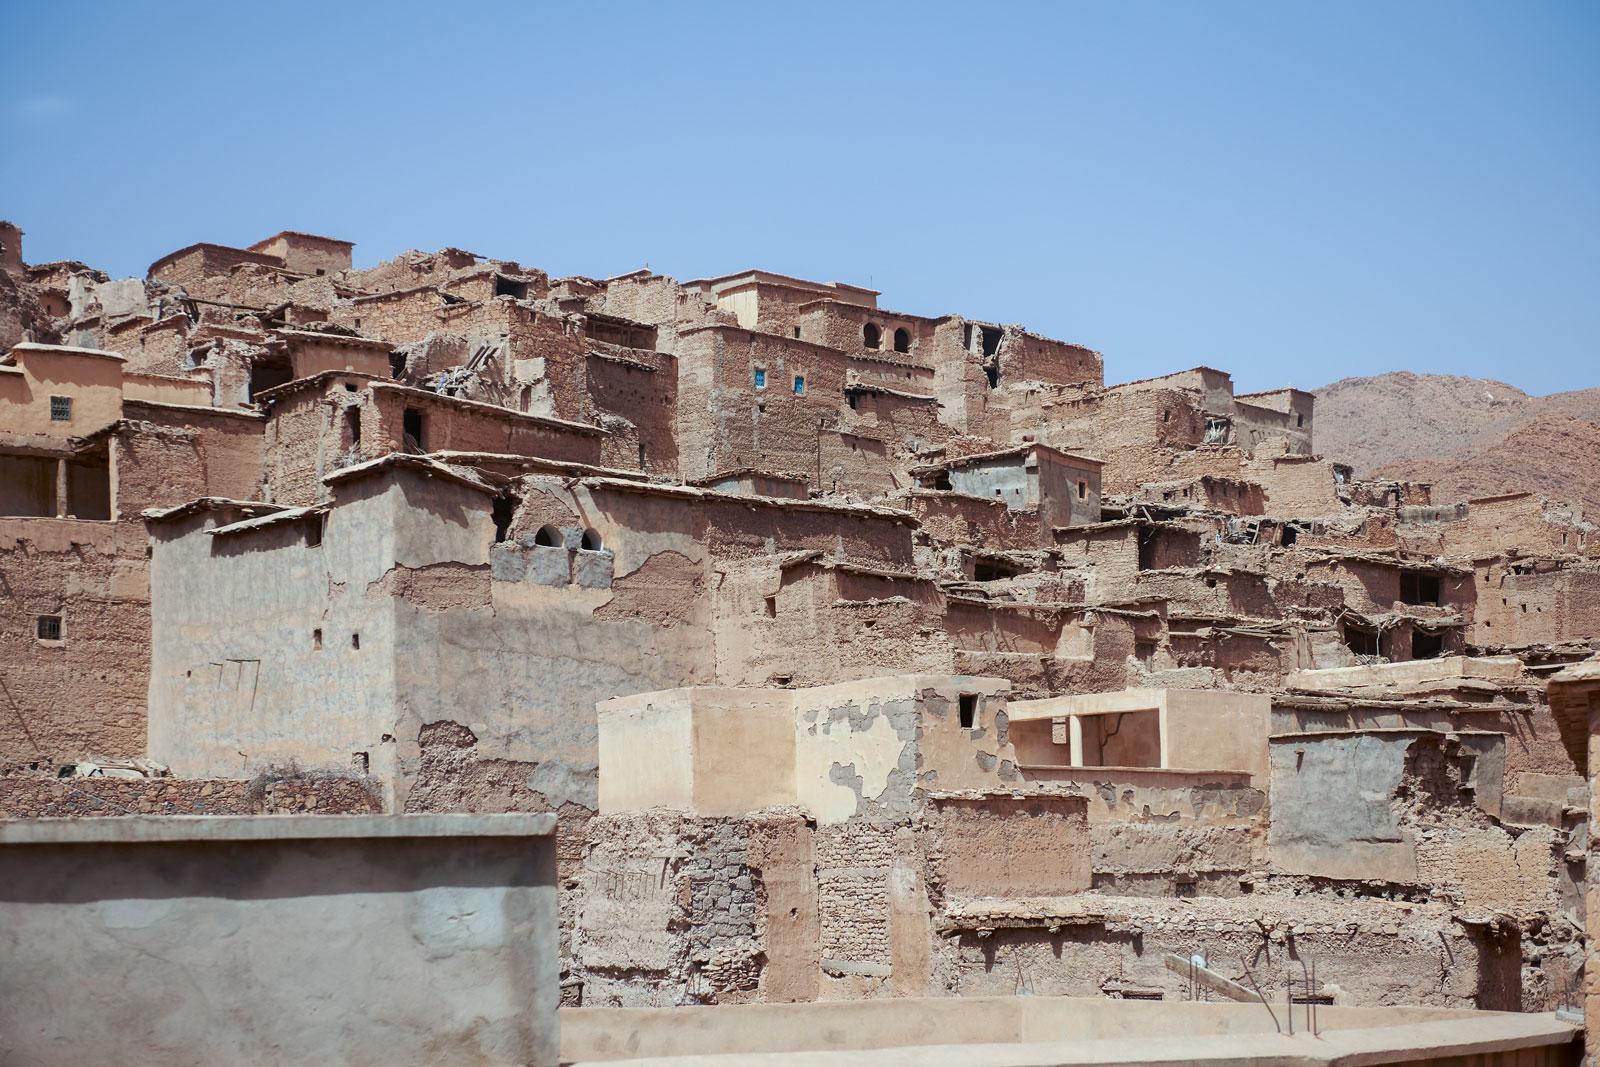 Bild einer verlassenen Stadt in den Bergen des Antiatlas Gebirges in Marokko